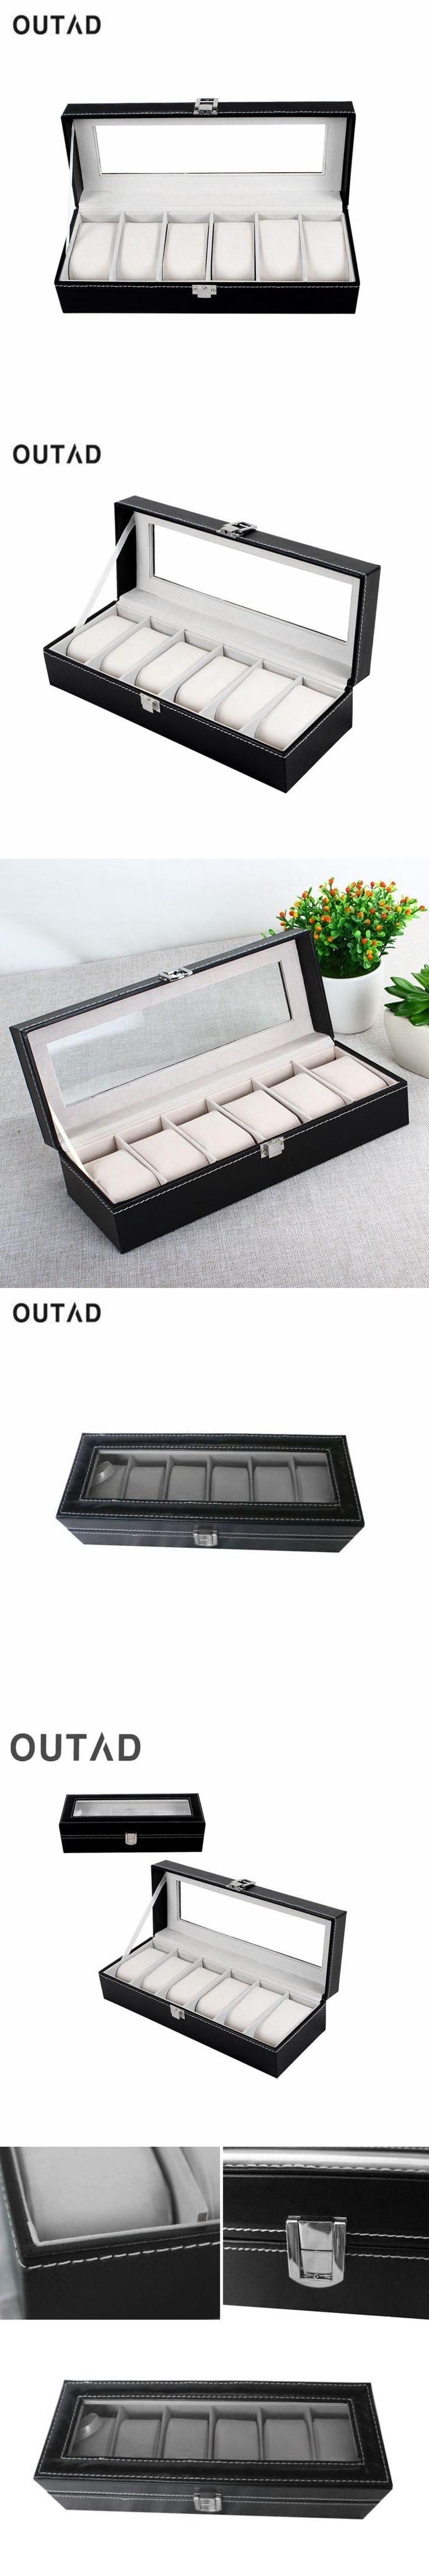 OUTAD Leather Watch Box Classic 6 Grids Luxury Refinement Slots Boxes Gift Case Jewelry Display Storage Holder Winder Organizer #luxuryjewelrydisplay